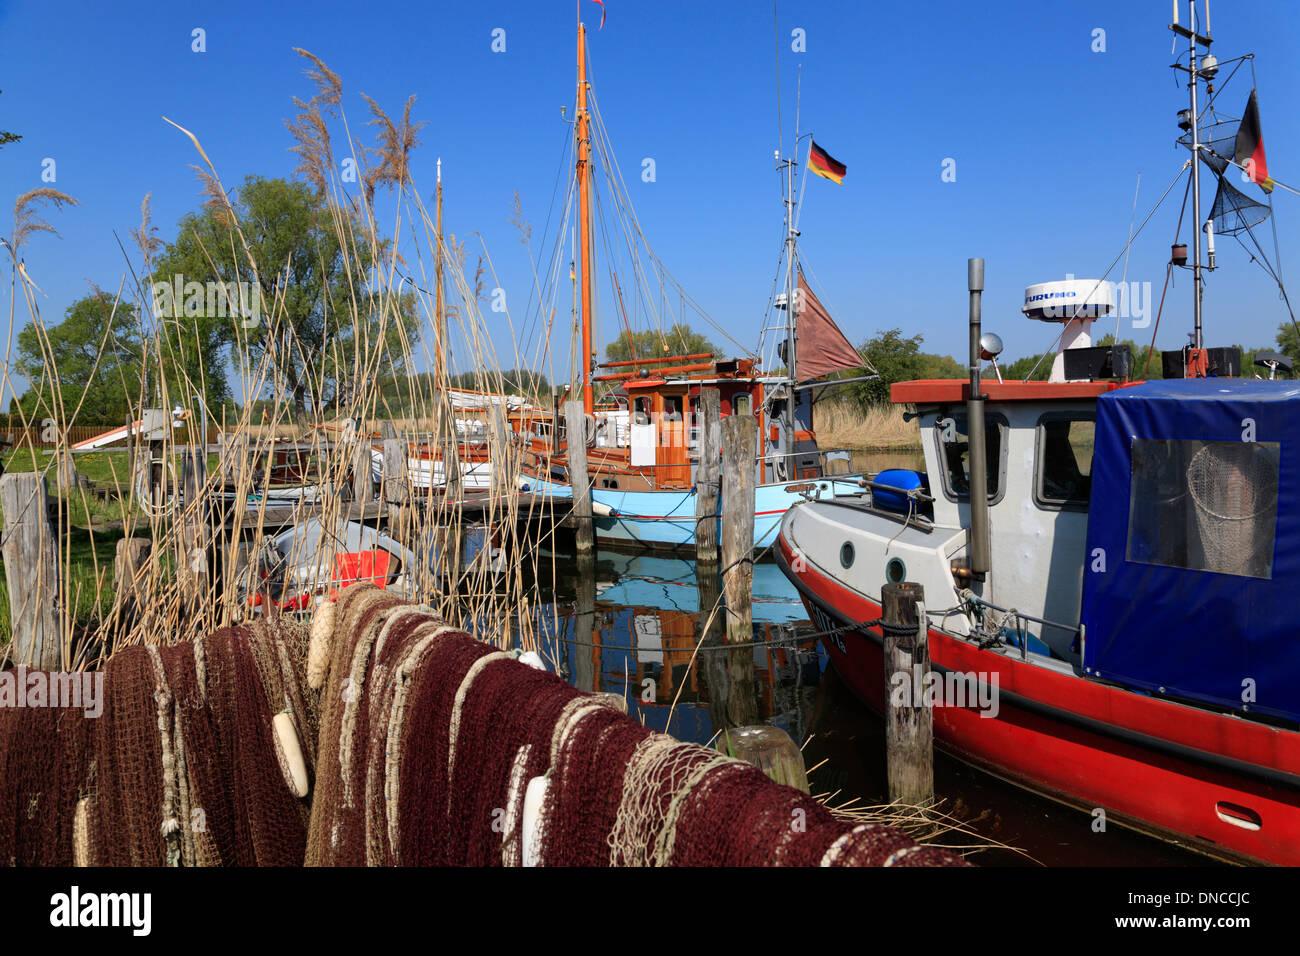 Fishing village Gothmund at river Trave, Schleswig-Holstein, Germany, Europe - Stock Image